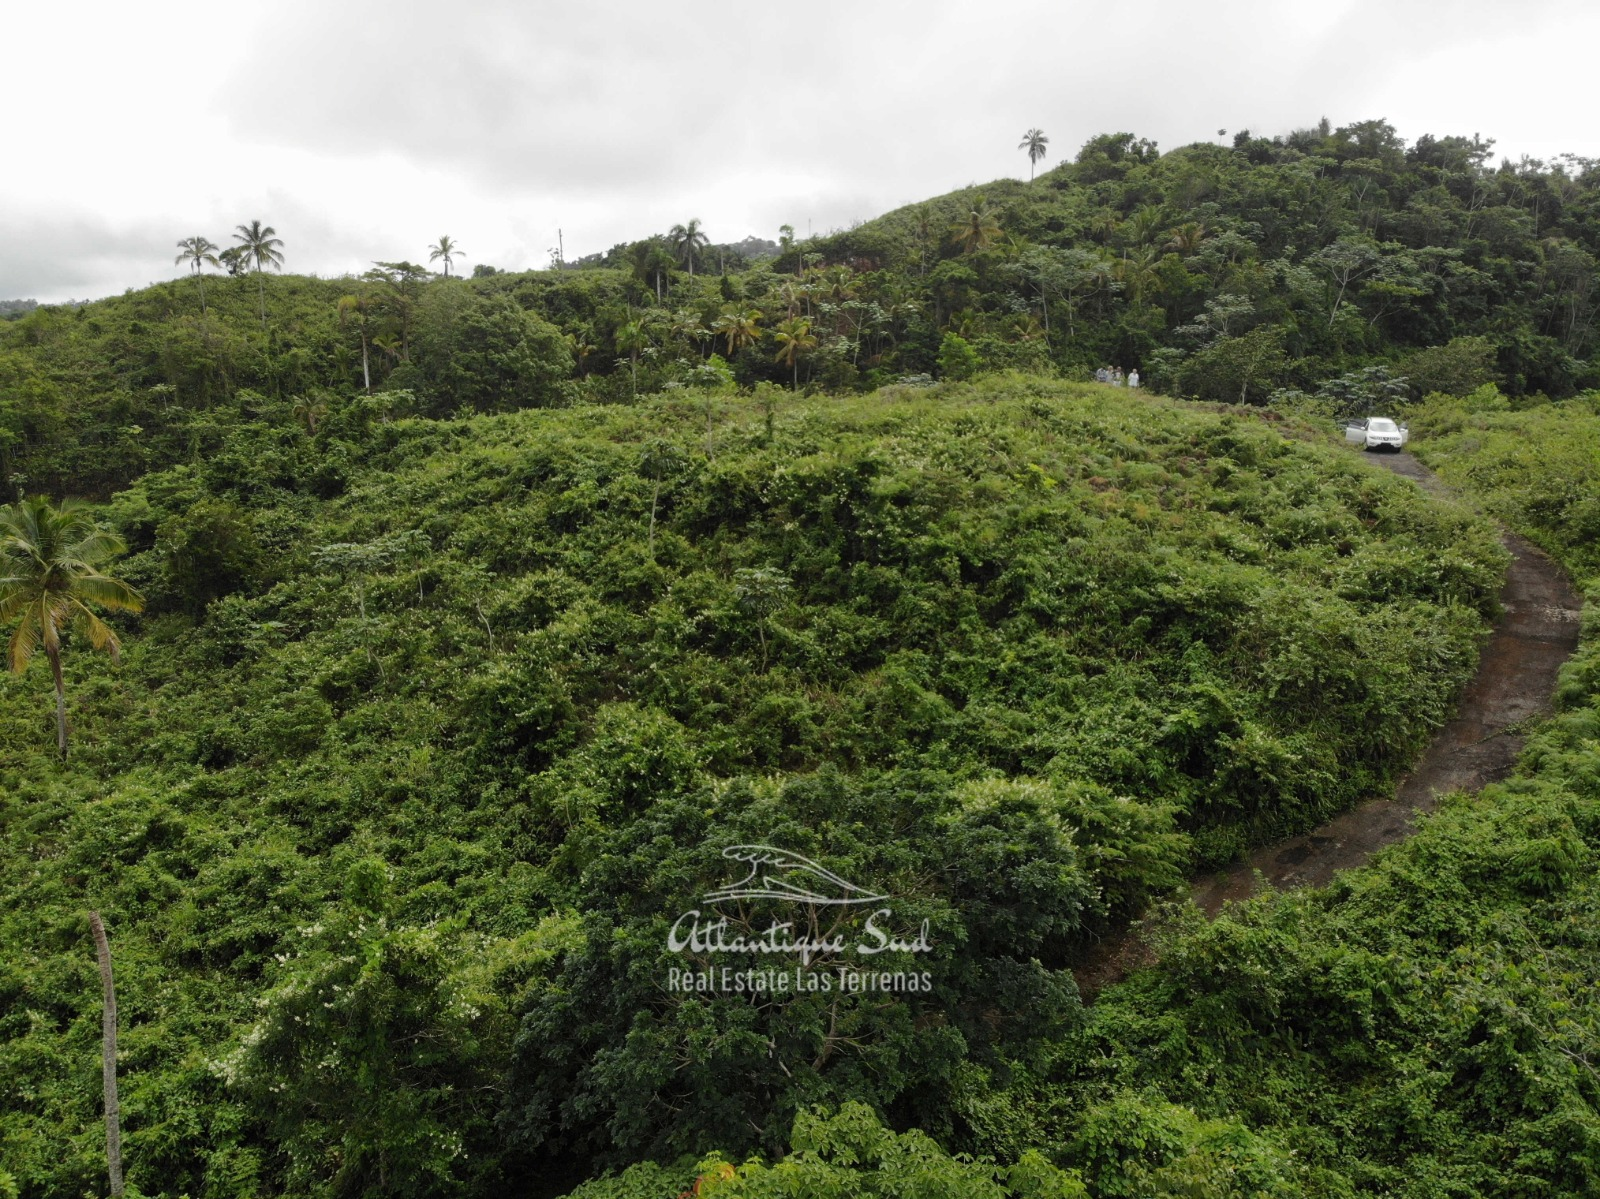 Hills for sale in Las Terrenas Dominican Republic 8.jpeg